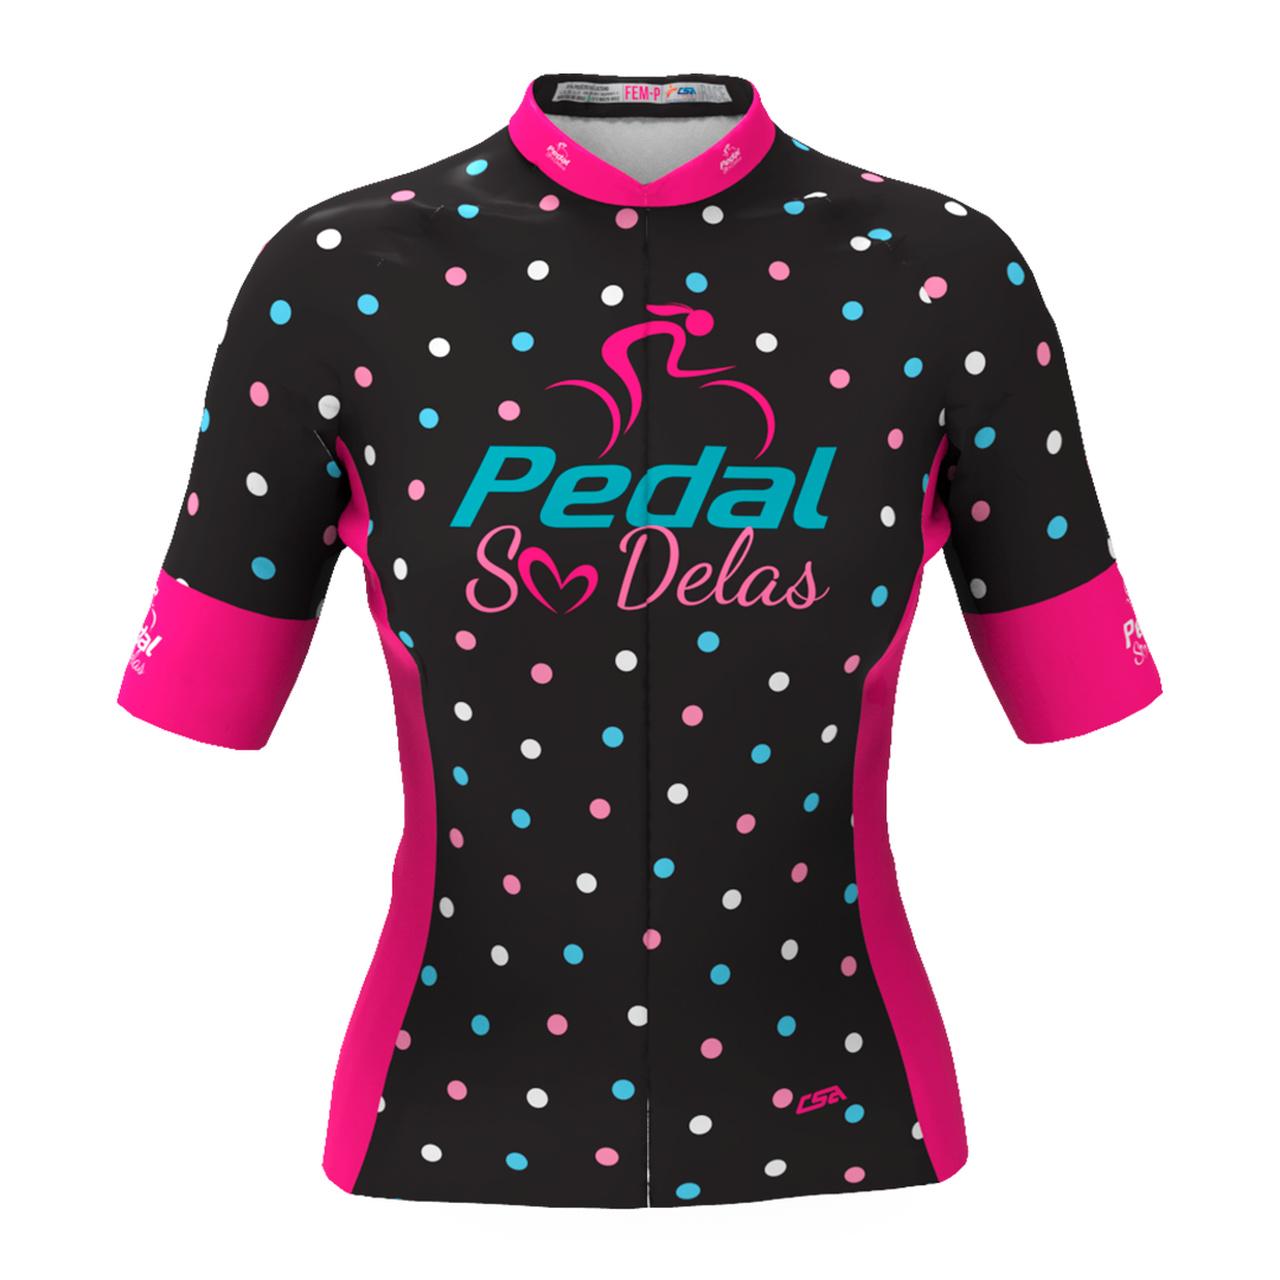 Camisa Ciclista Tour Pedal Só Delas Feminina Preto-Poá